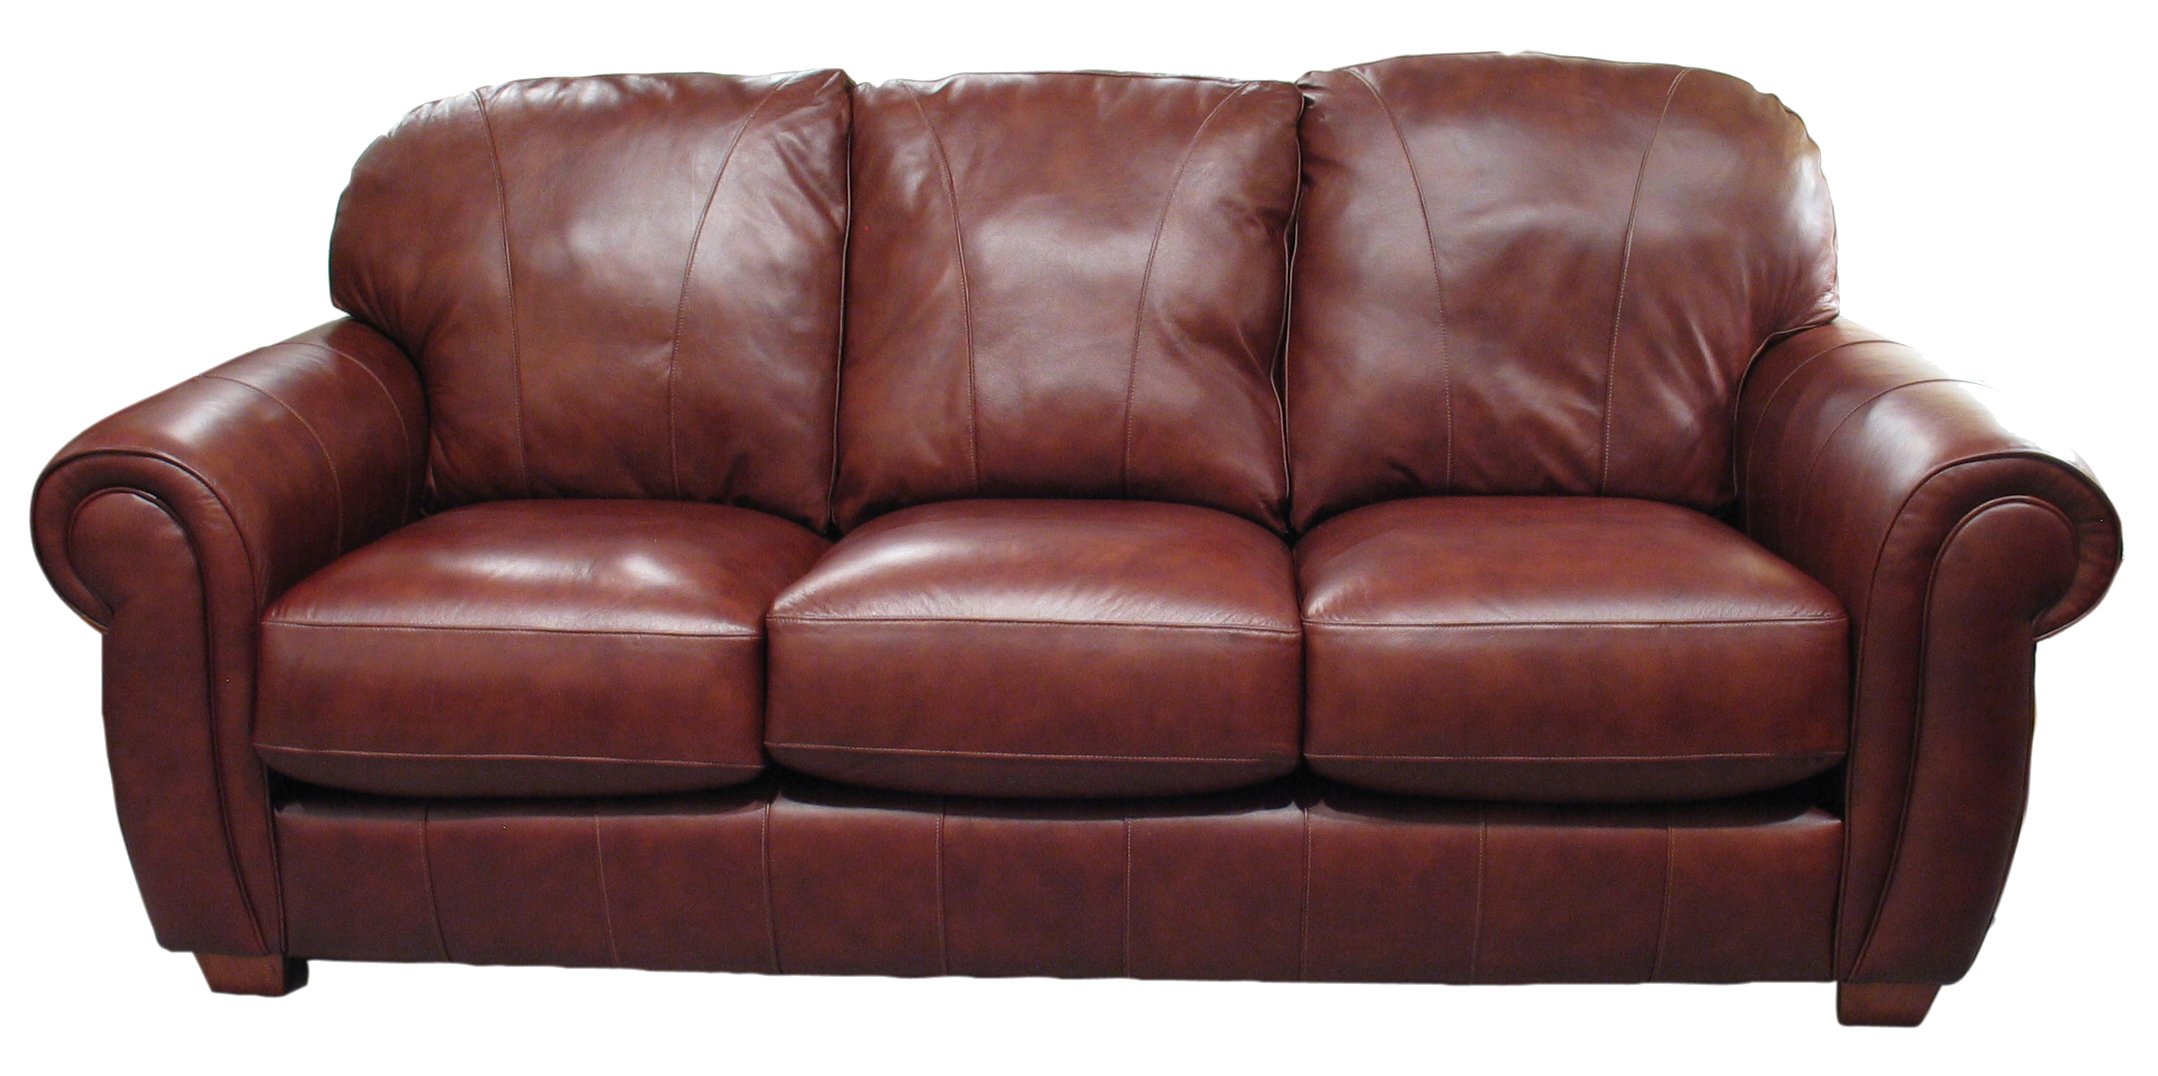 Sofa HD PNG - 118086